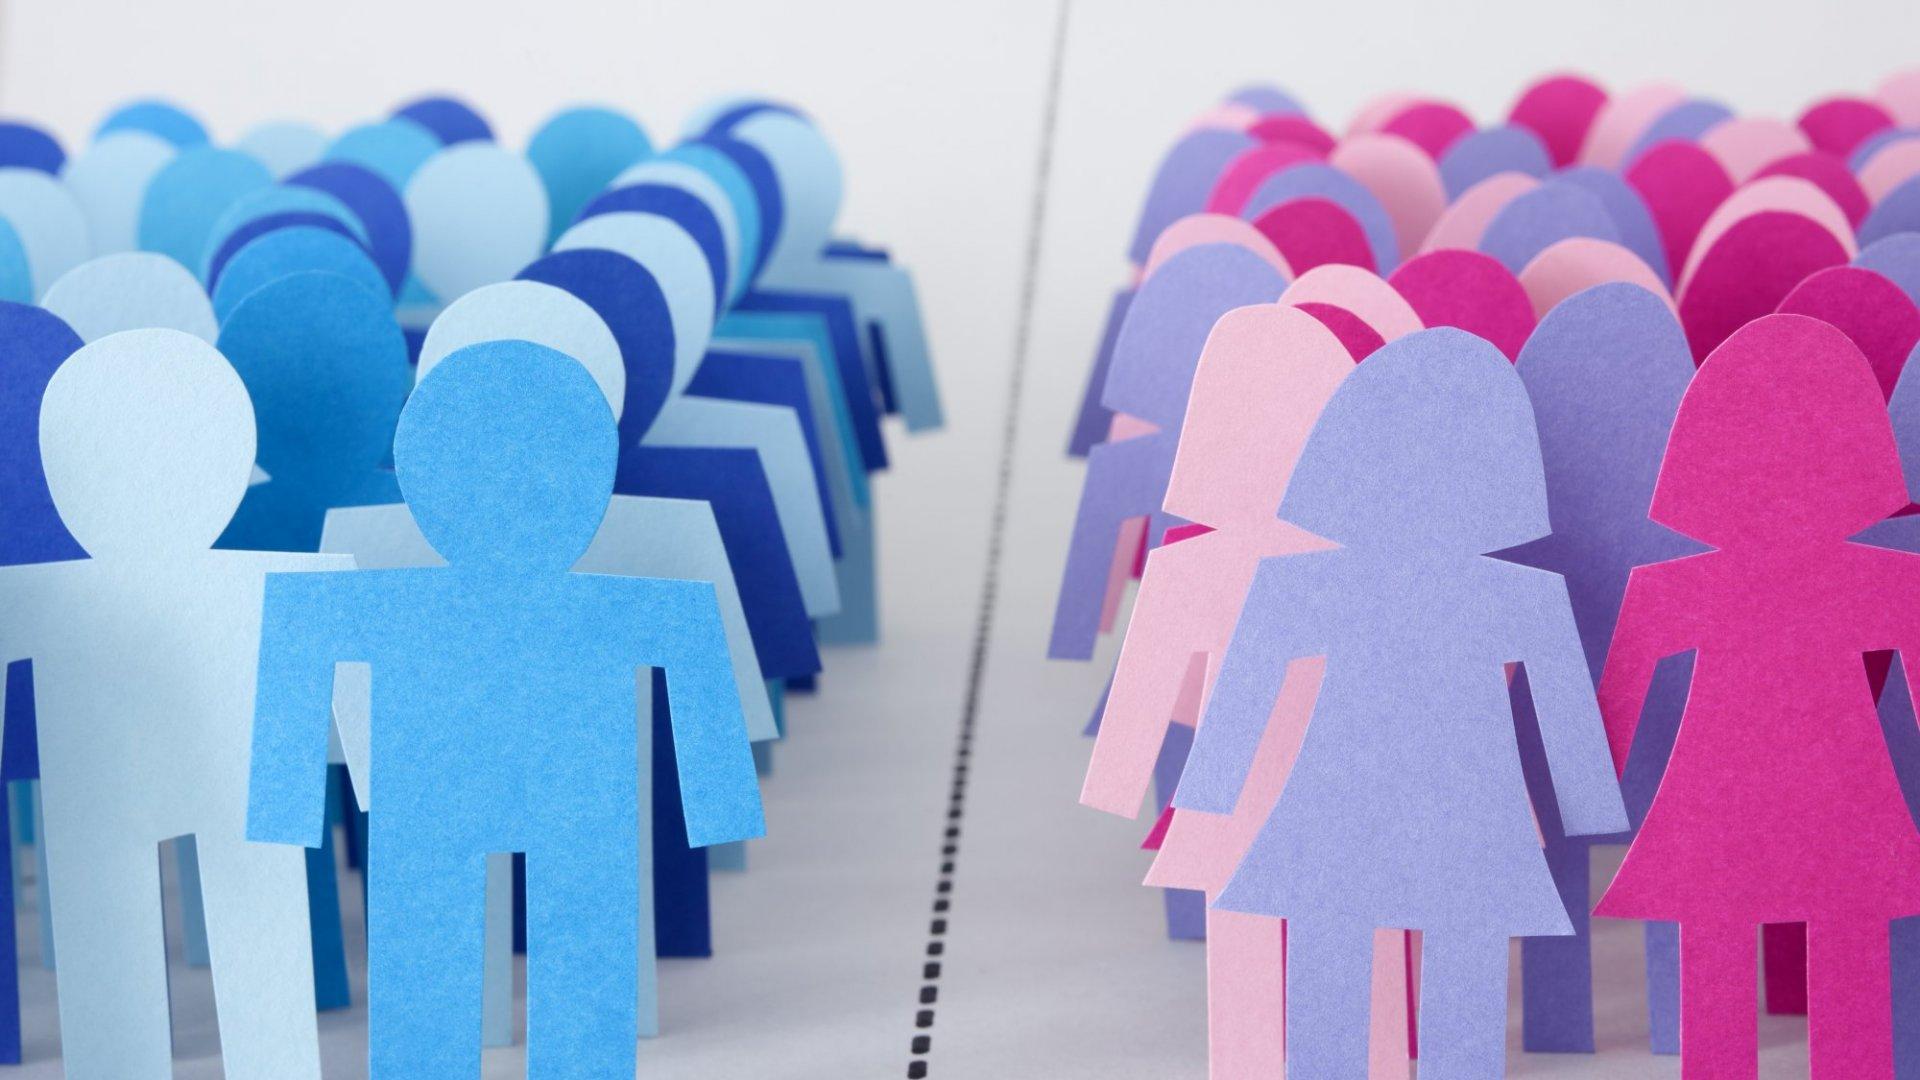 The Gender Gap Is Narrowing, but Gender Intelligence Is Still Lacking